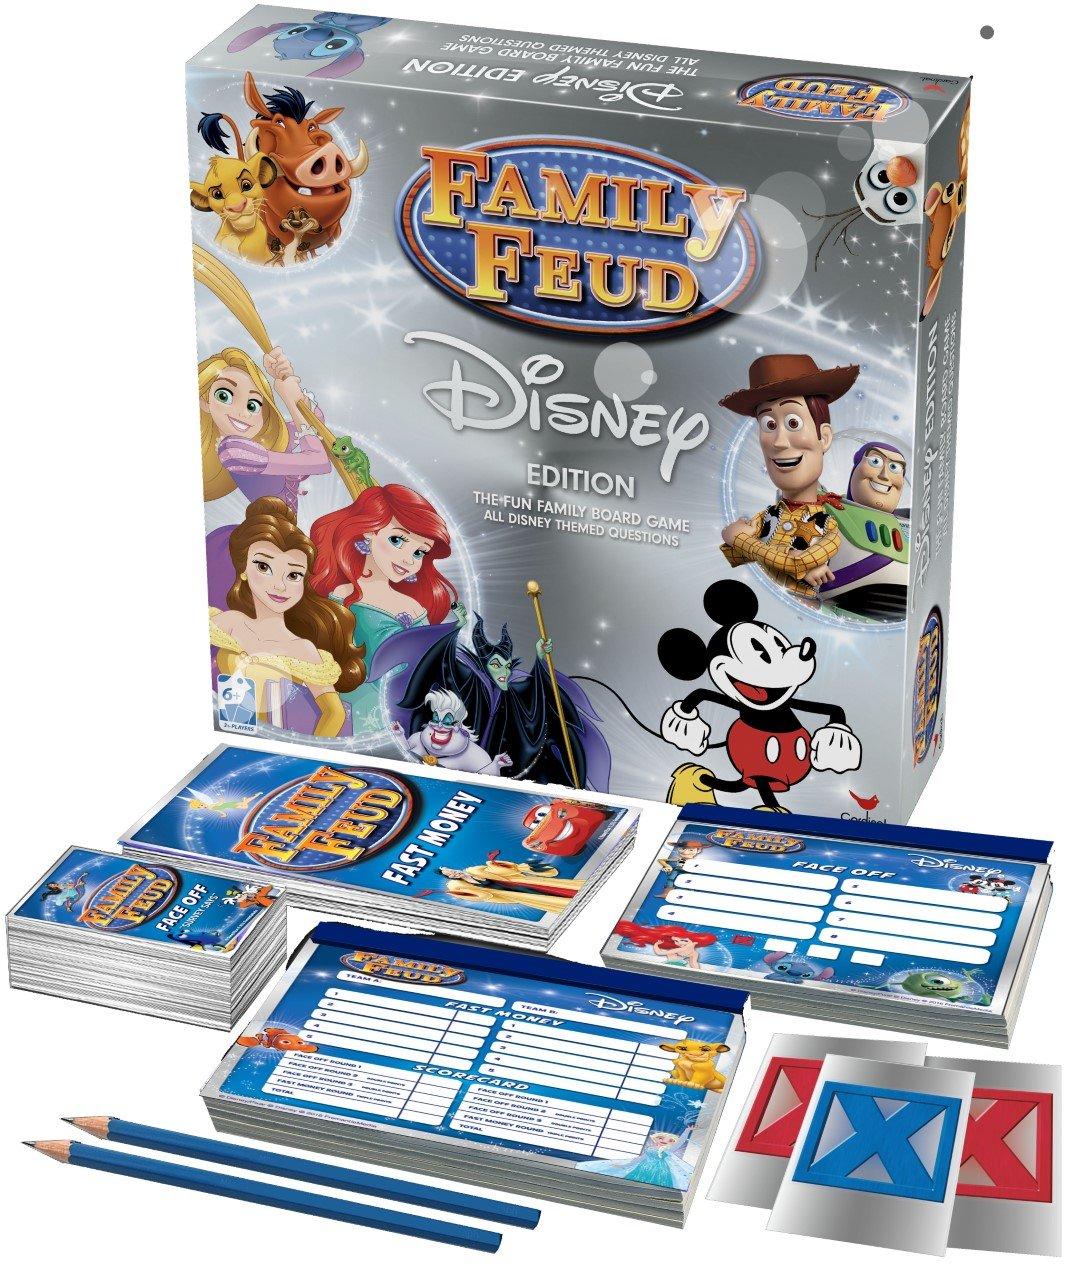 Disney Family Feud Signature Game Image 2